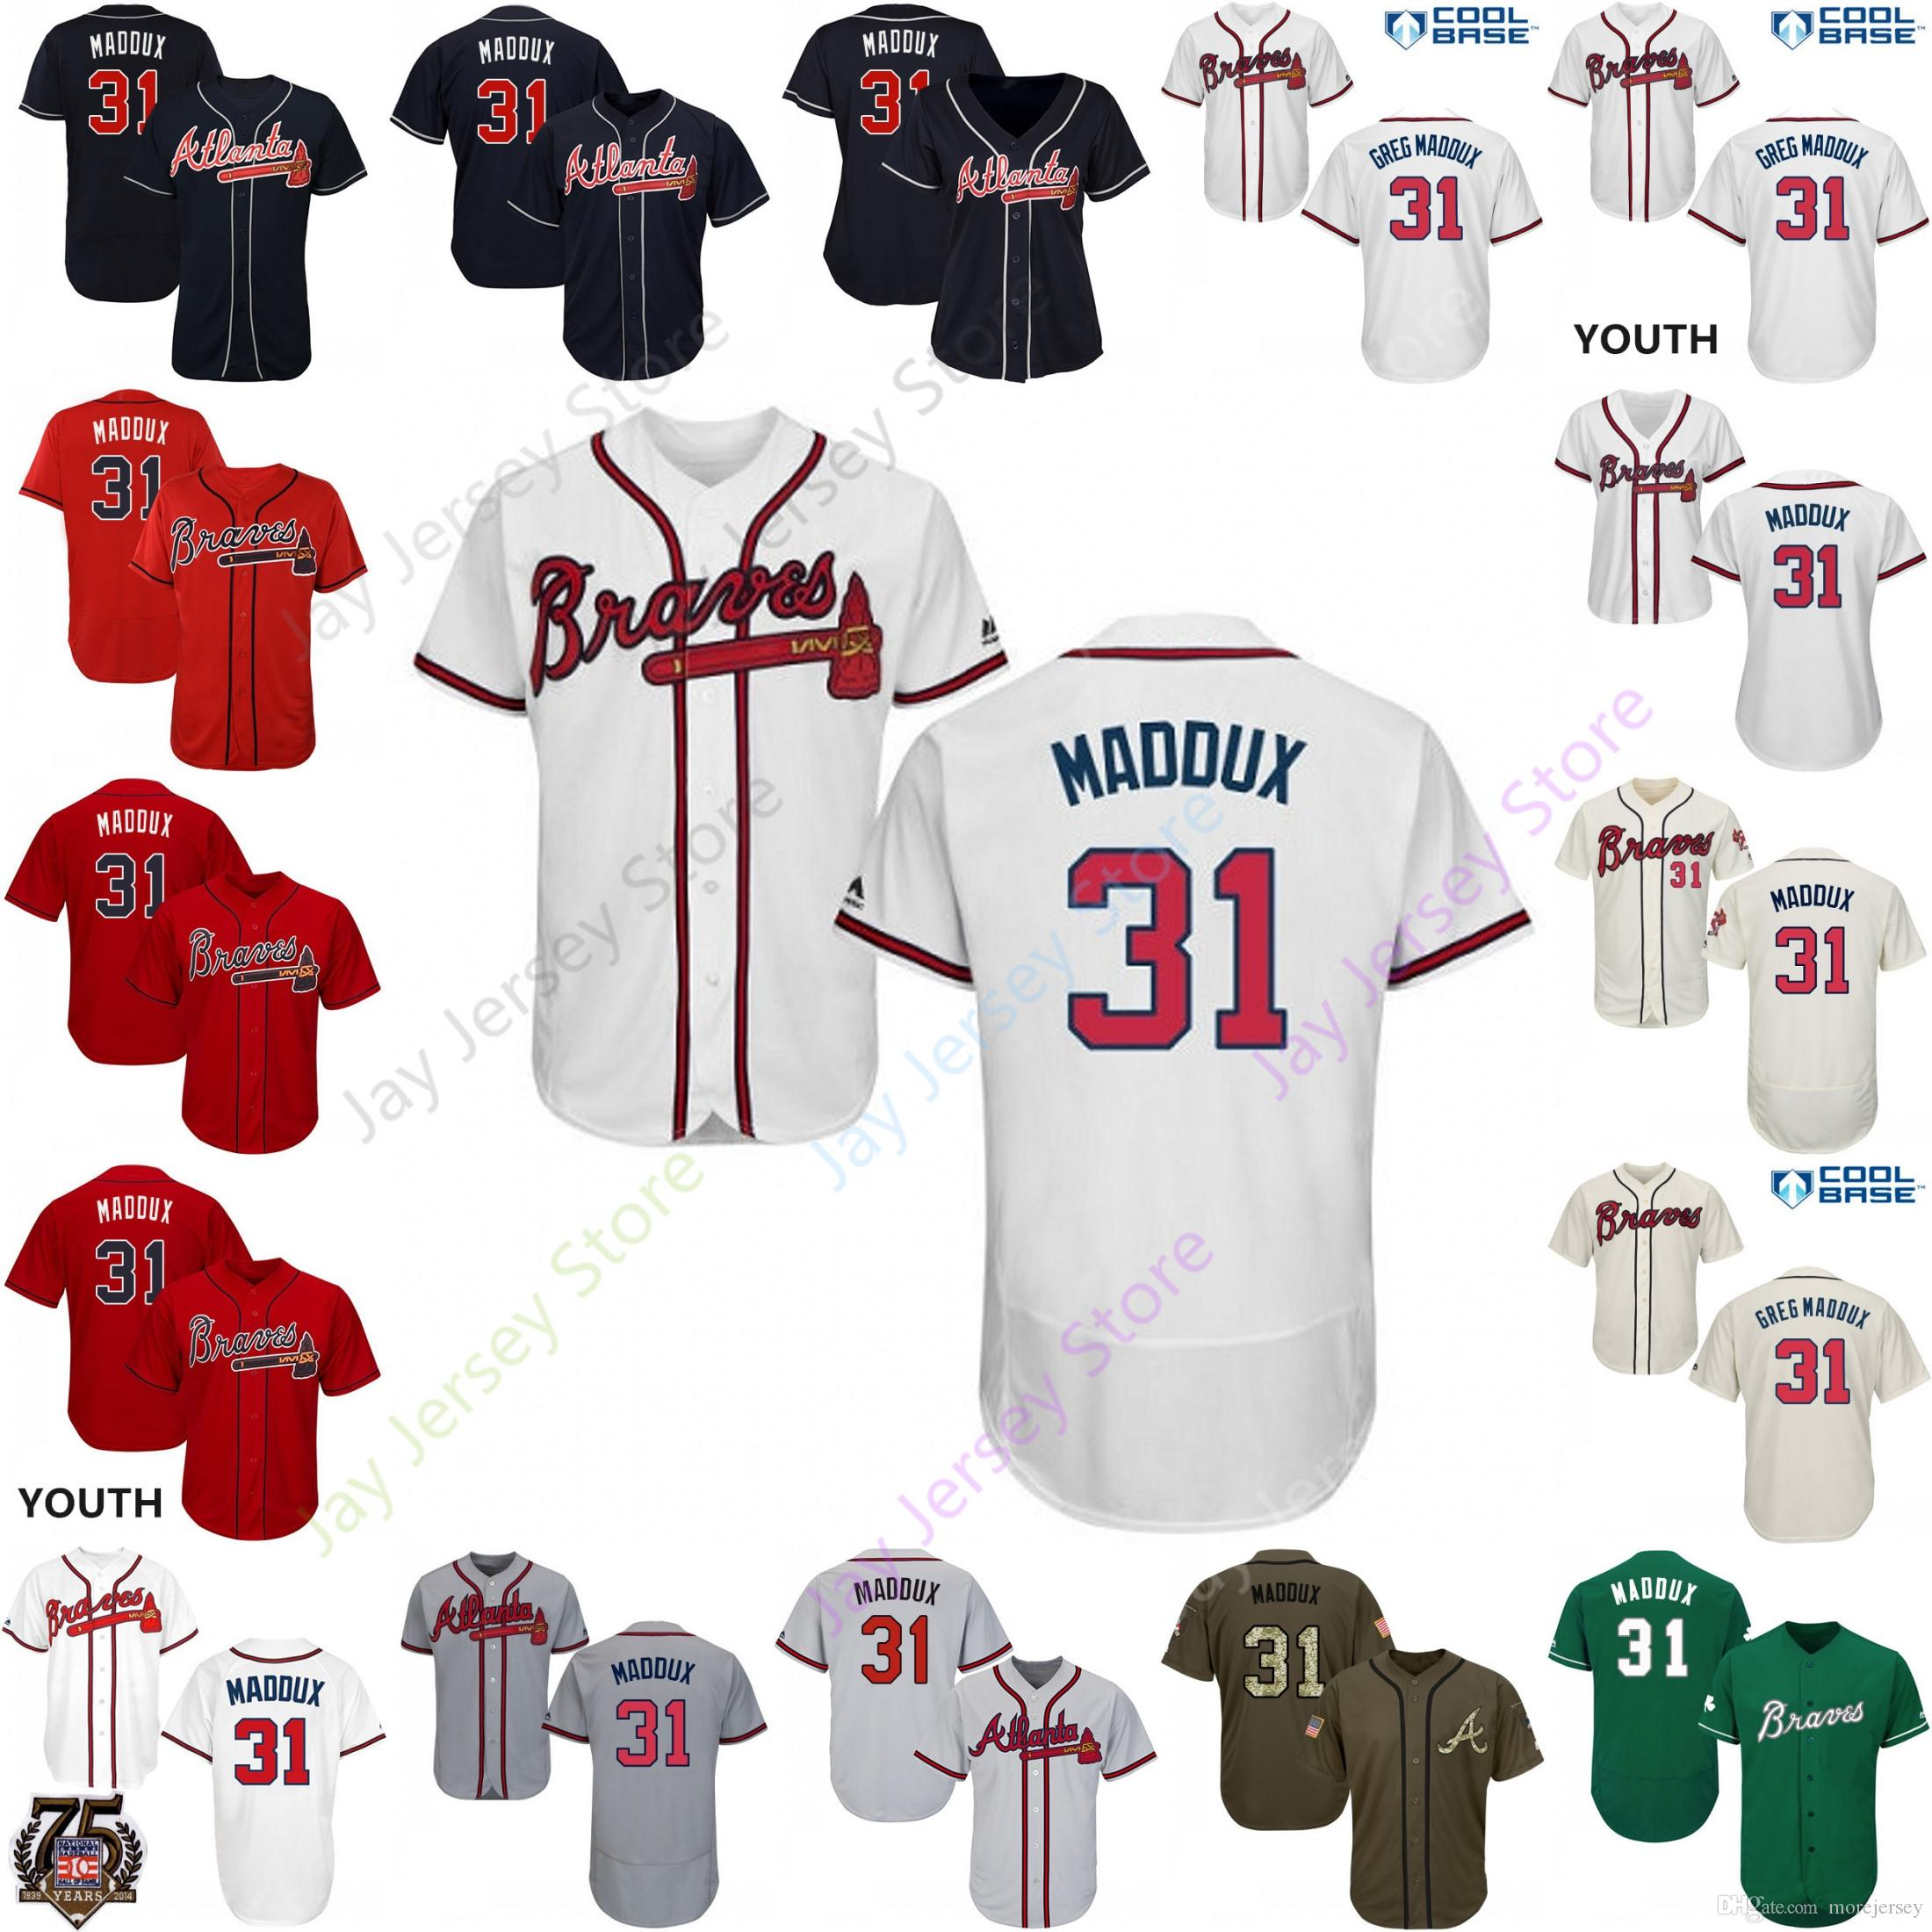 big sale 8020d 84ee1 2019 Atlanta Greg 31 Maddux Jersey Braves Jerseys Pullover Button Cool Base  Flexbase Home Away White Black Red Grey Men Women Youth Cheap